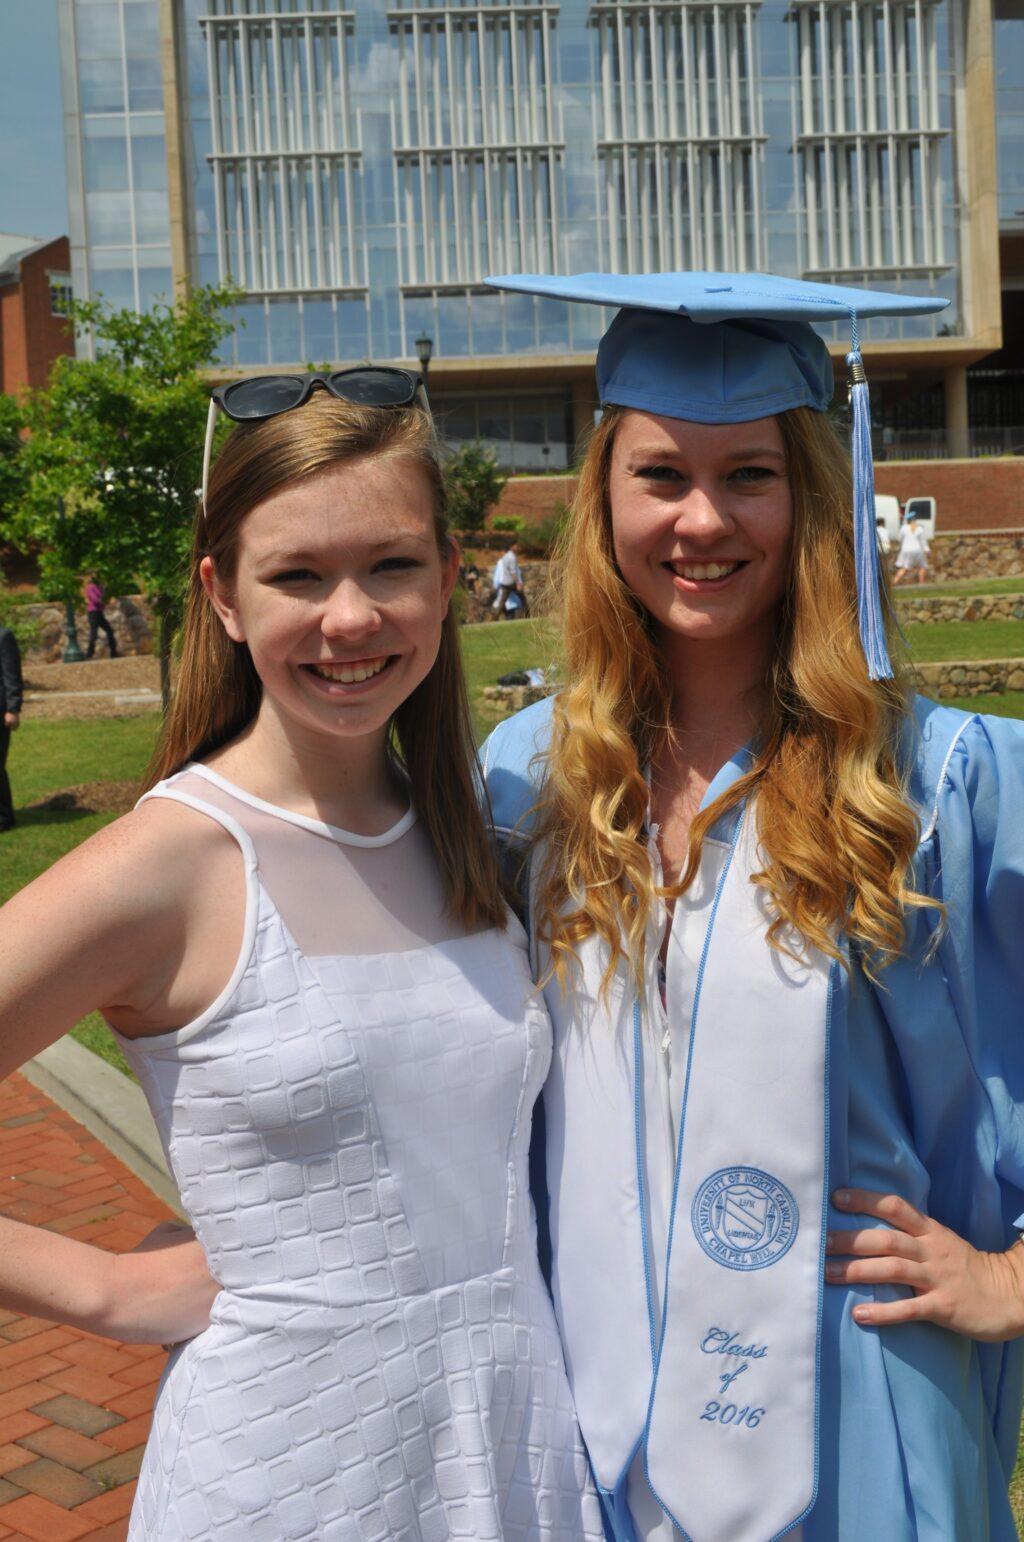 Sisters at UNC graduation